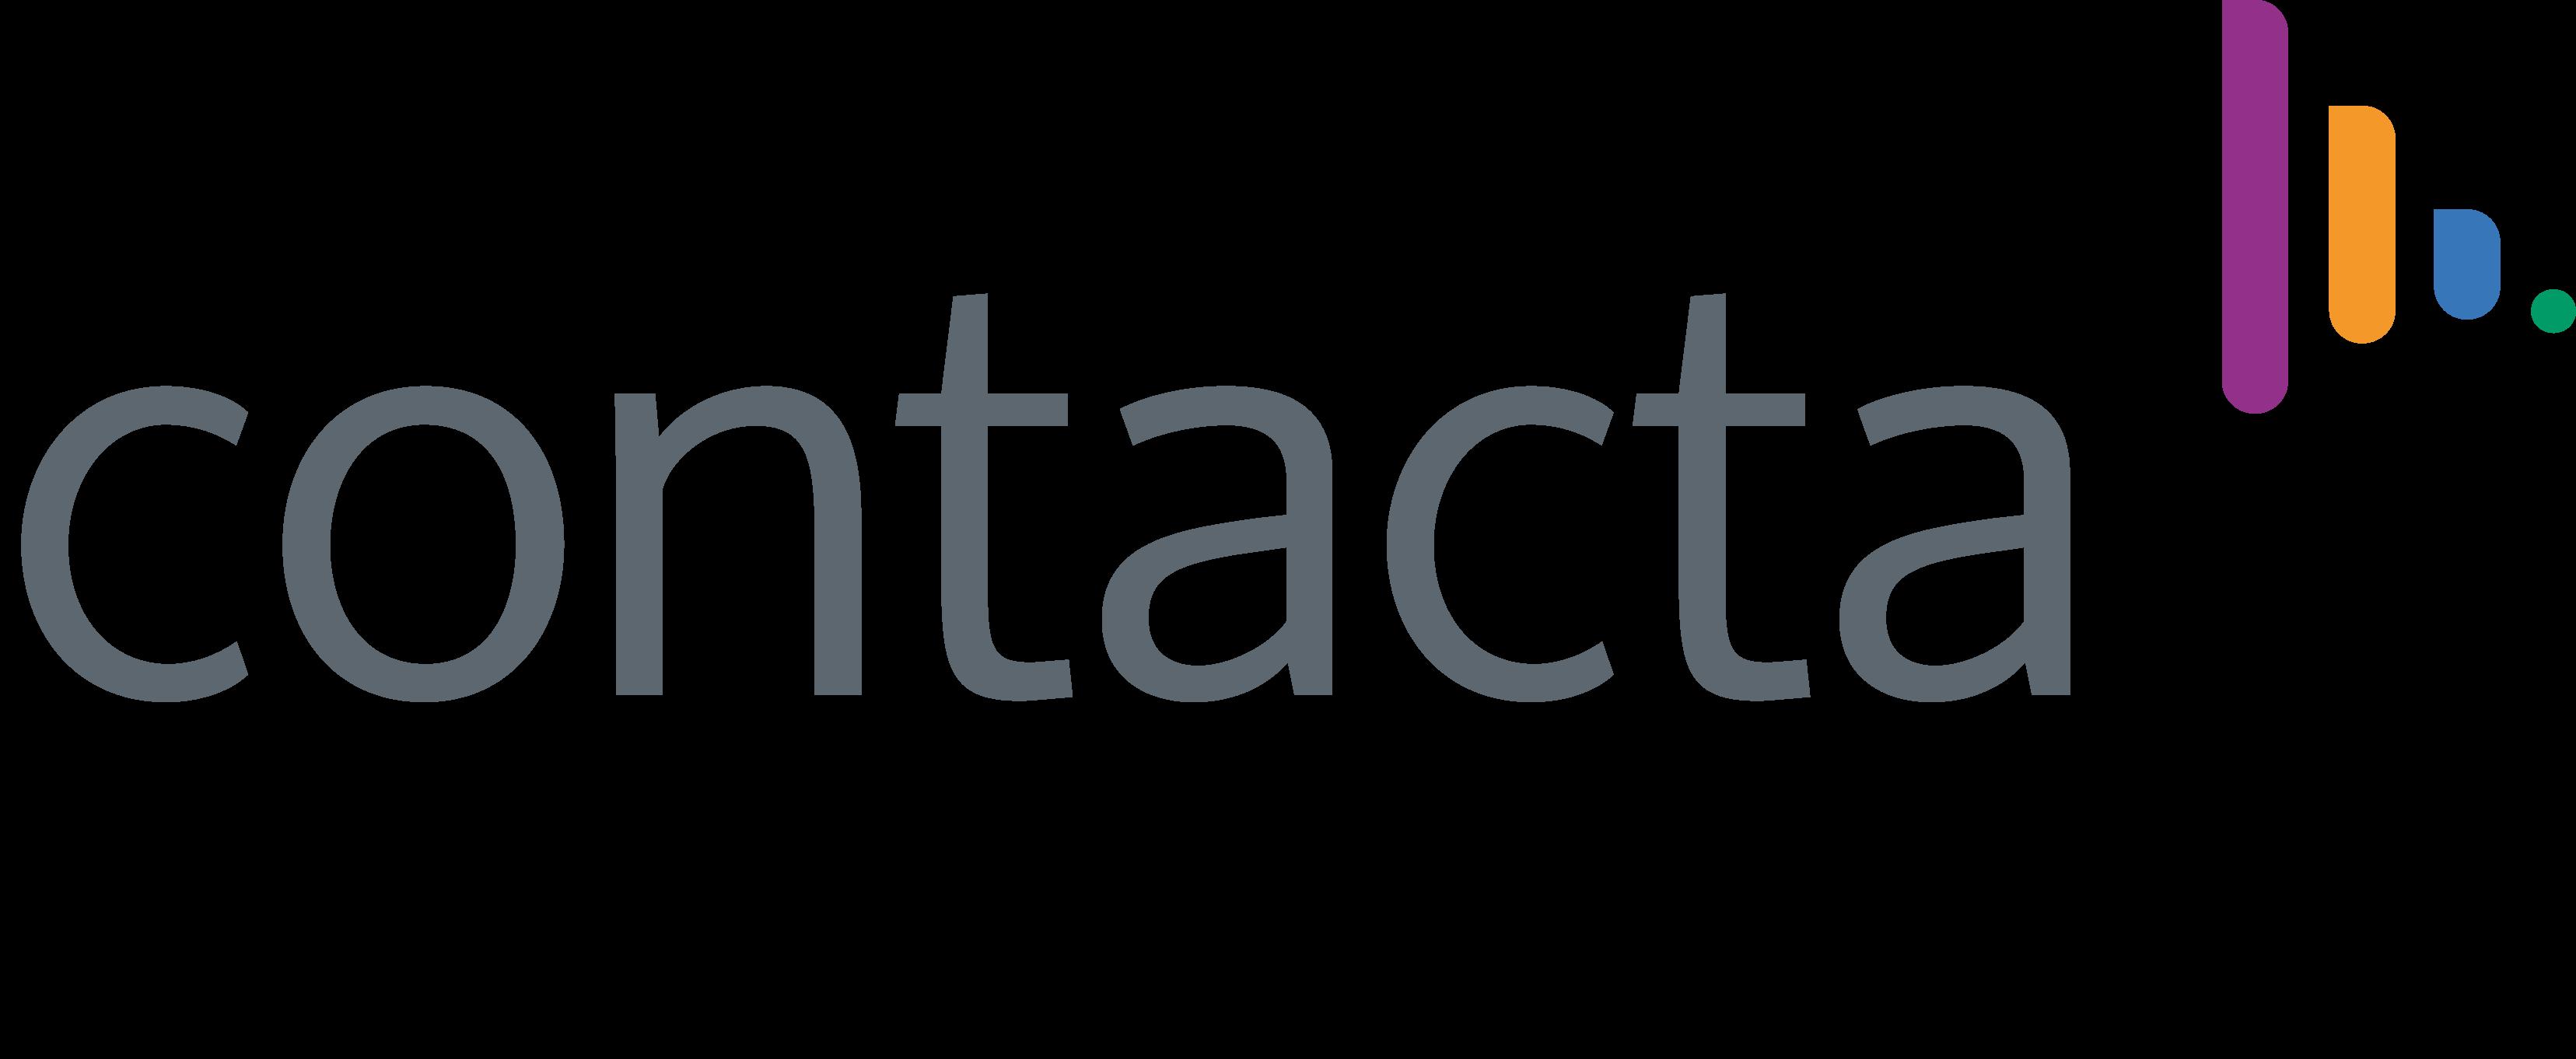 http://www.risk-pro.com/wp-content/uploads/2018/09/Contacta-New-Logo.png